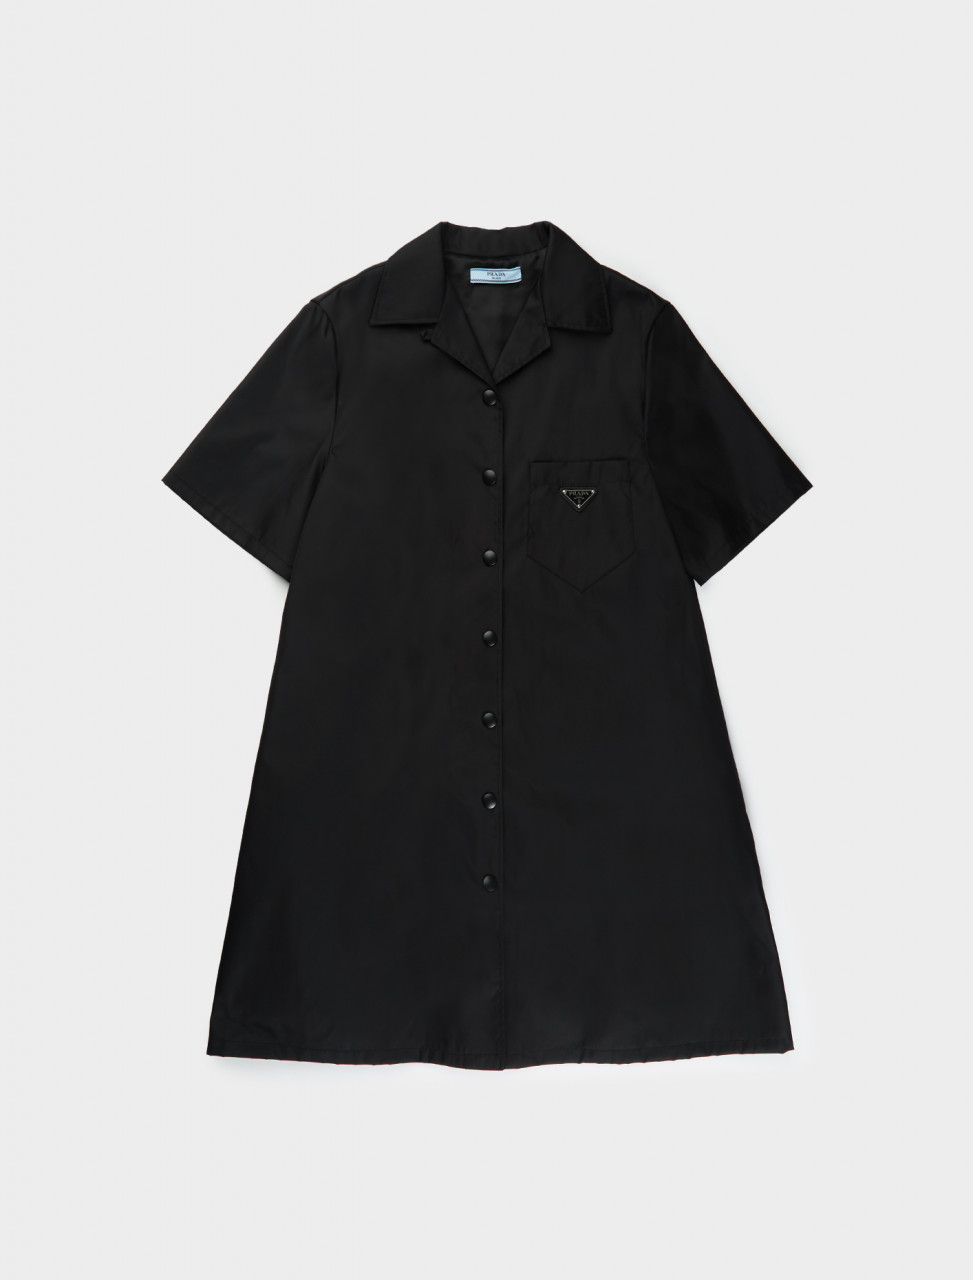 Prada Re-Nylon Shirt Dress in Black